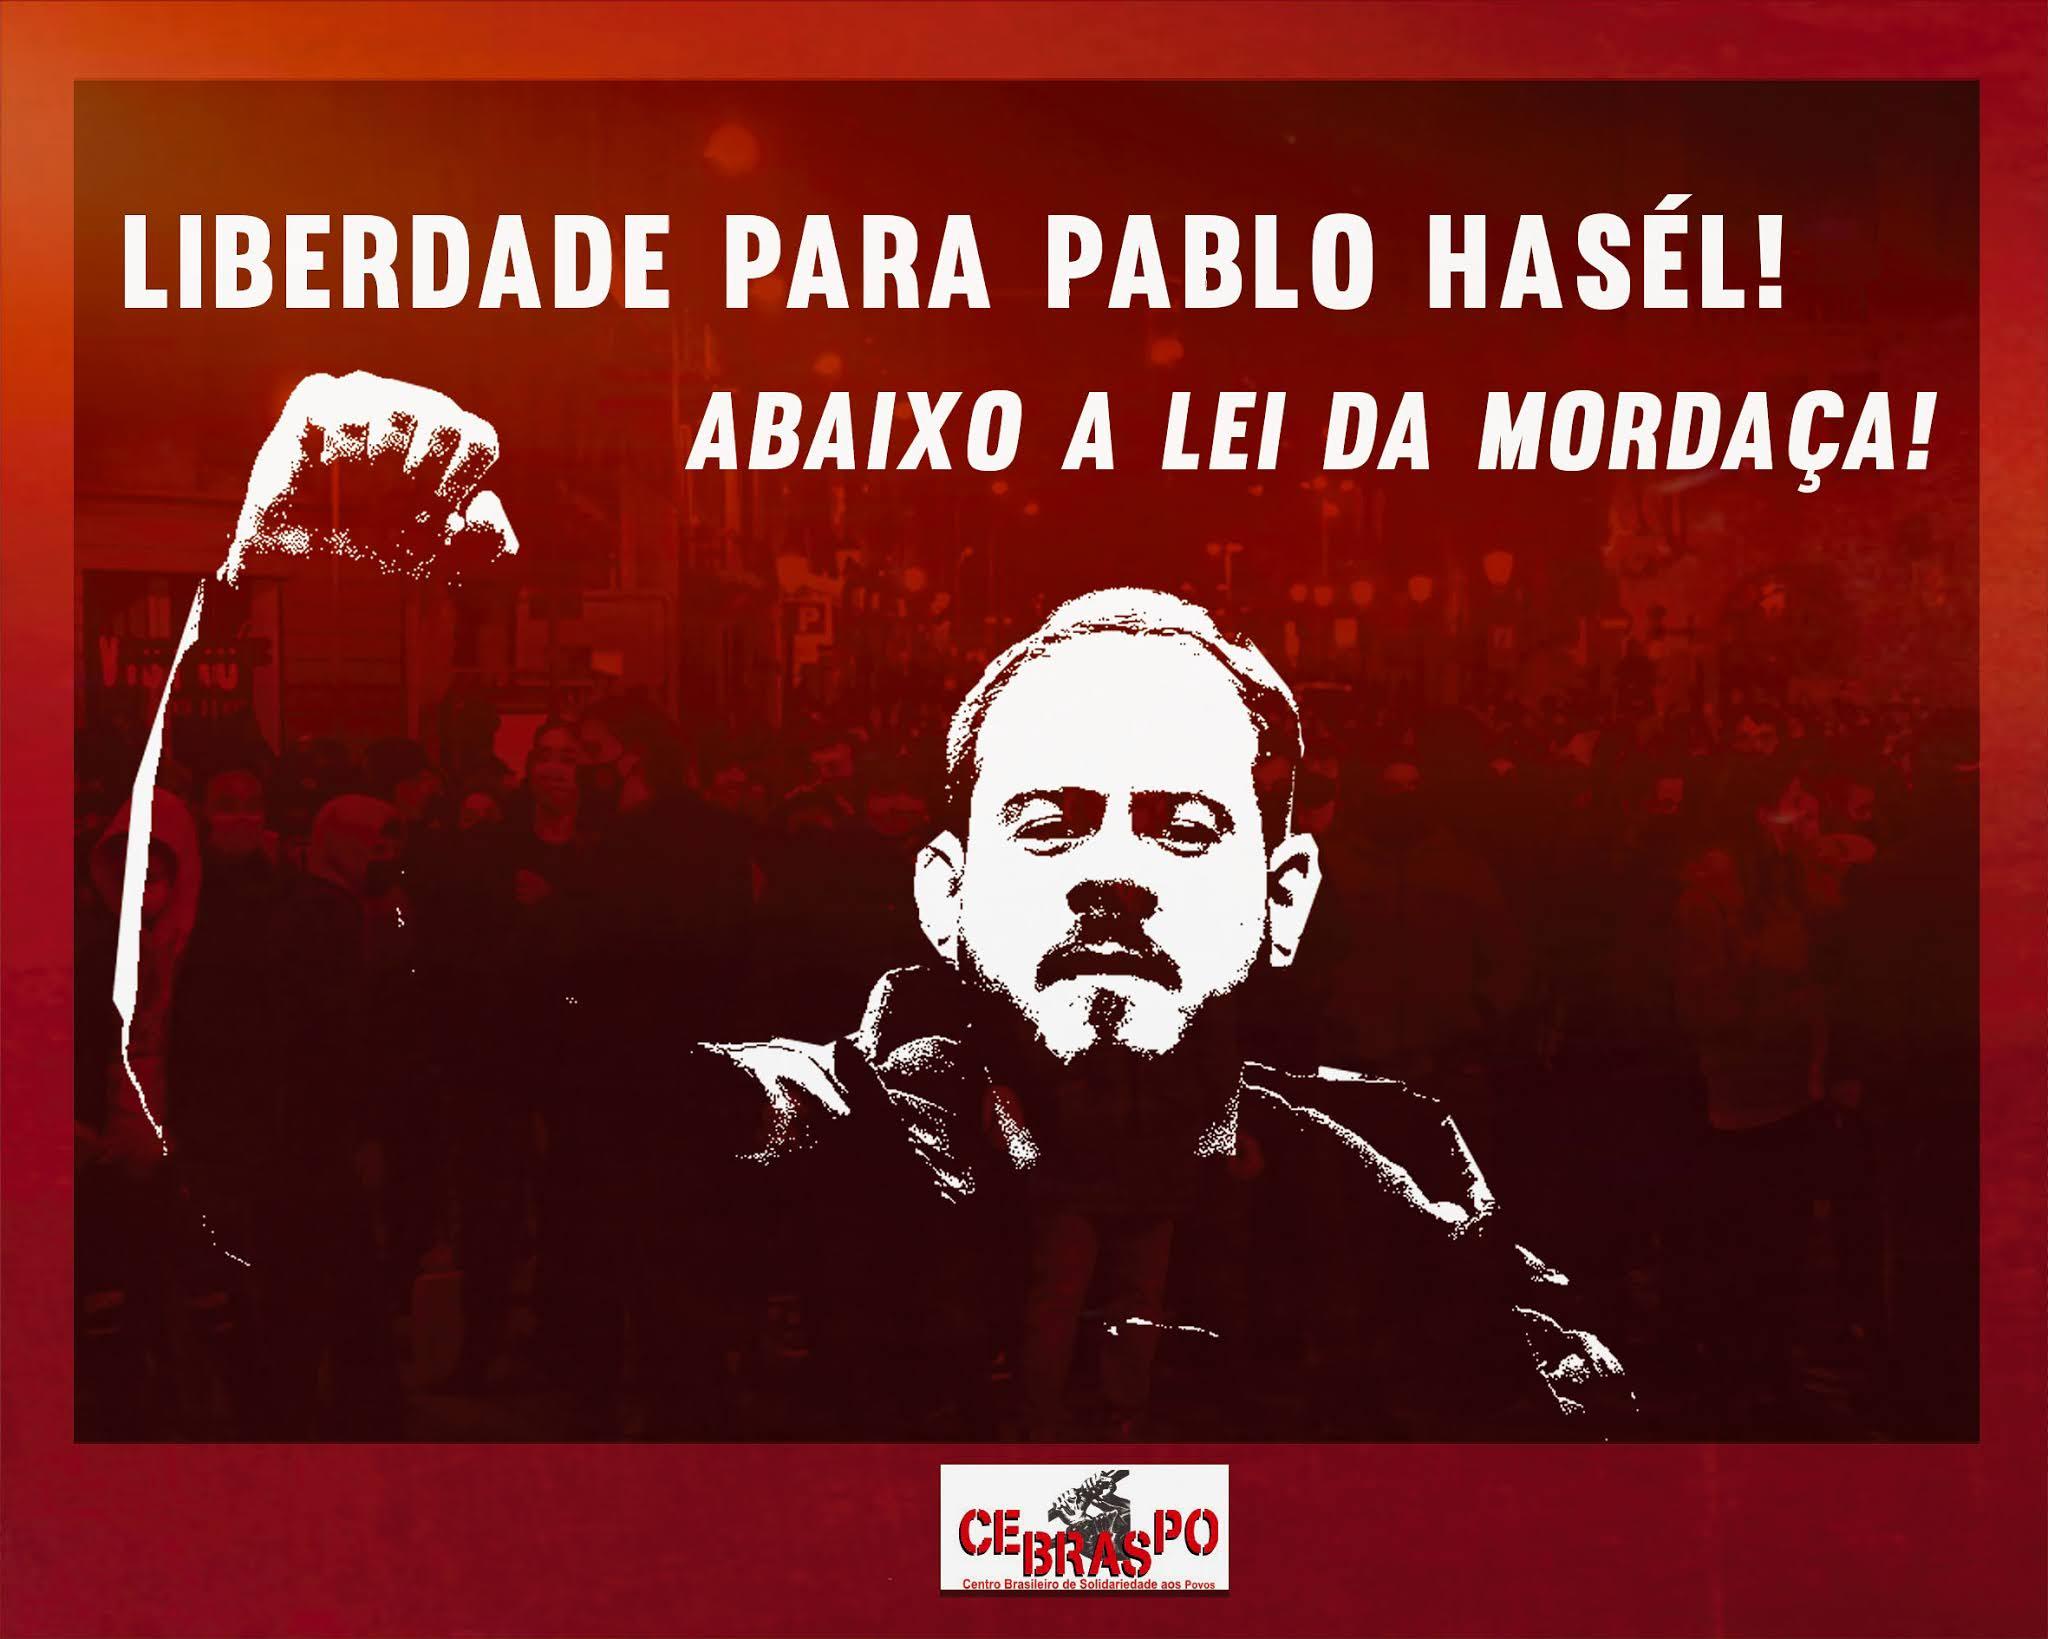 LIBERDADE PARA PABLO HÁSEL